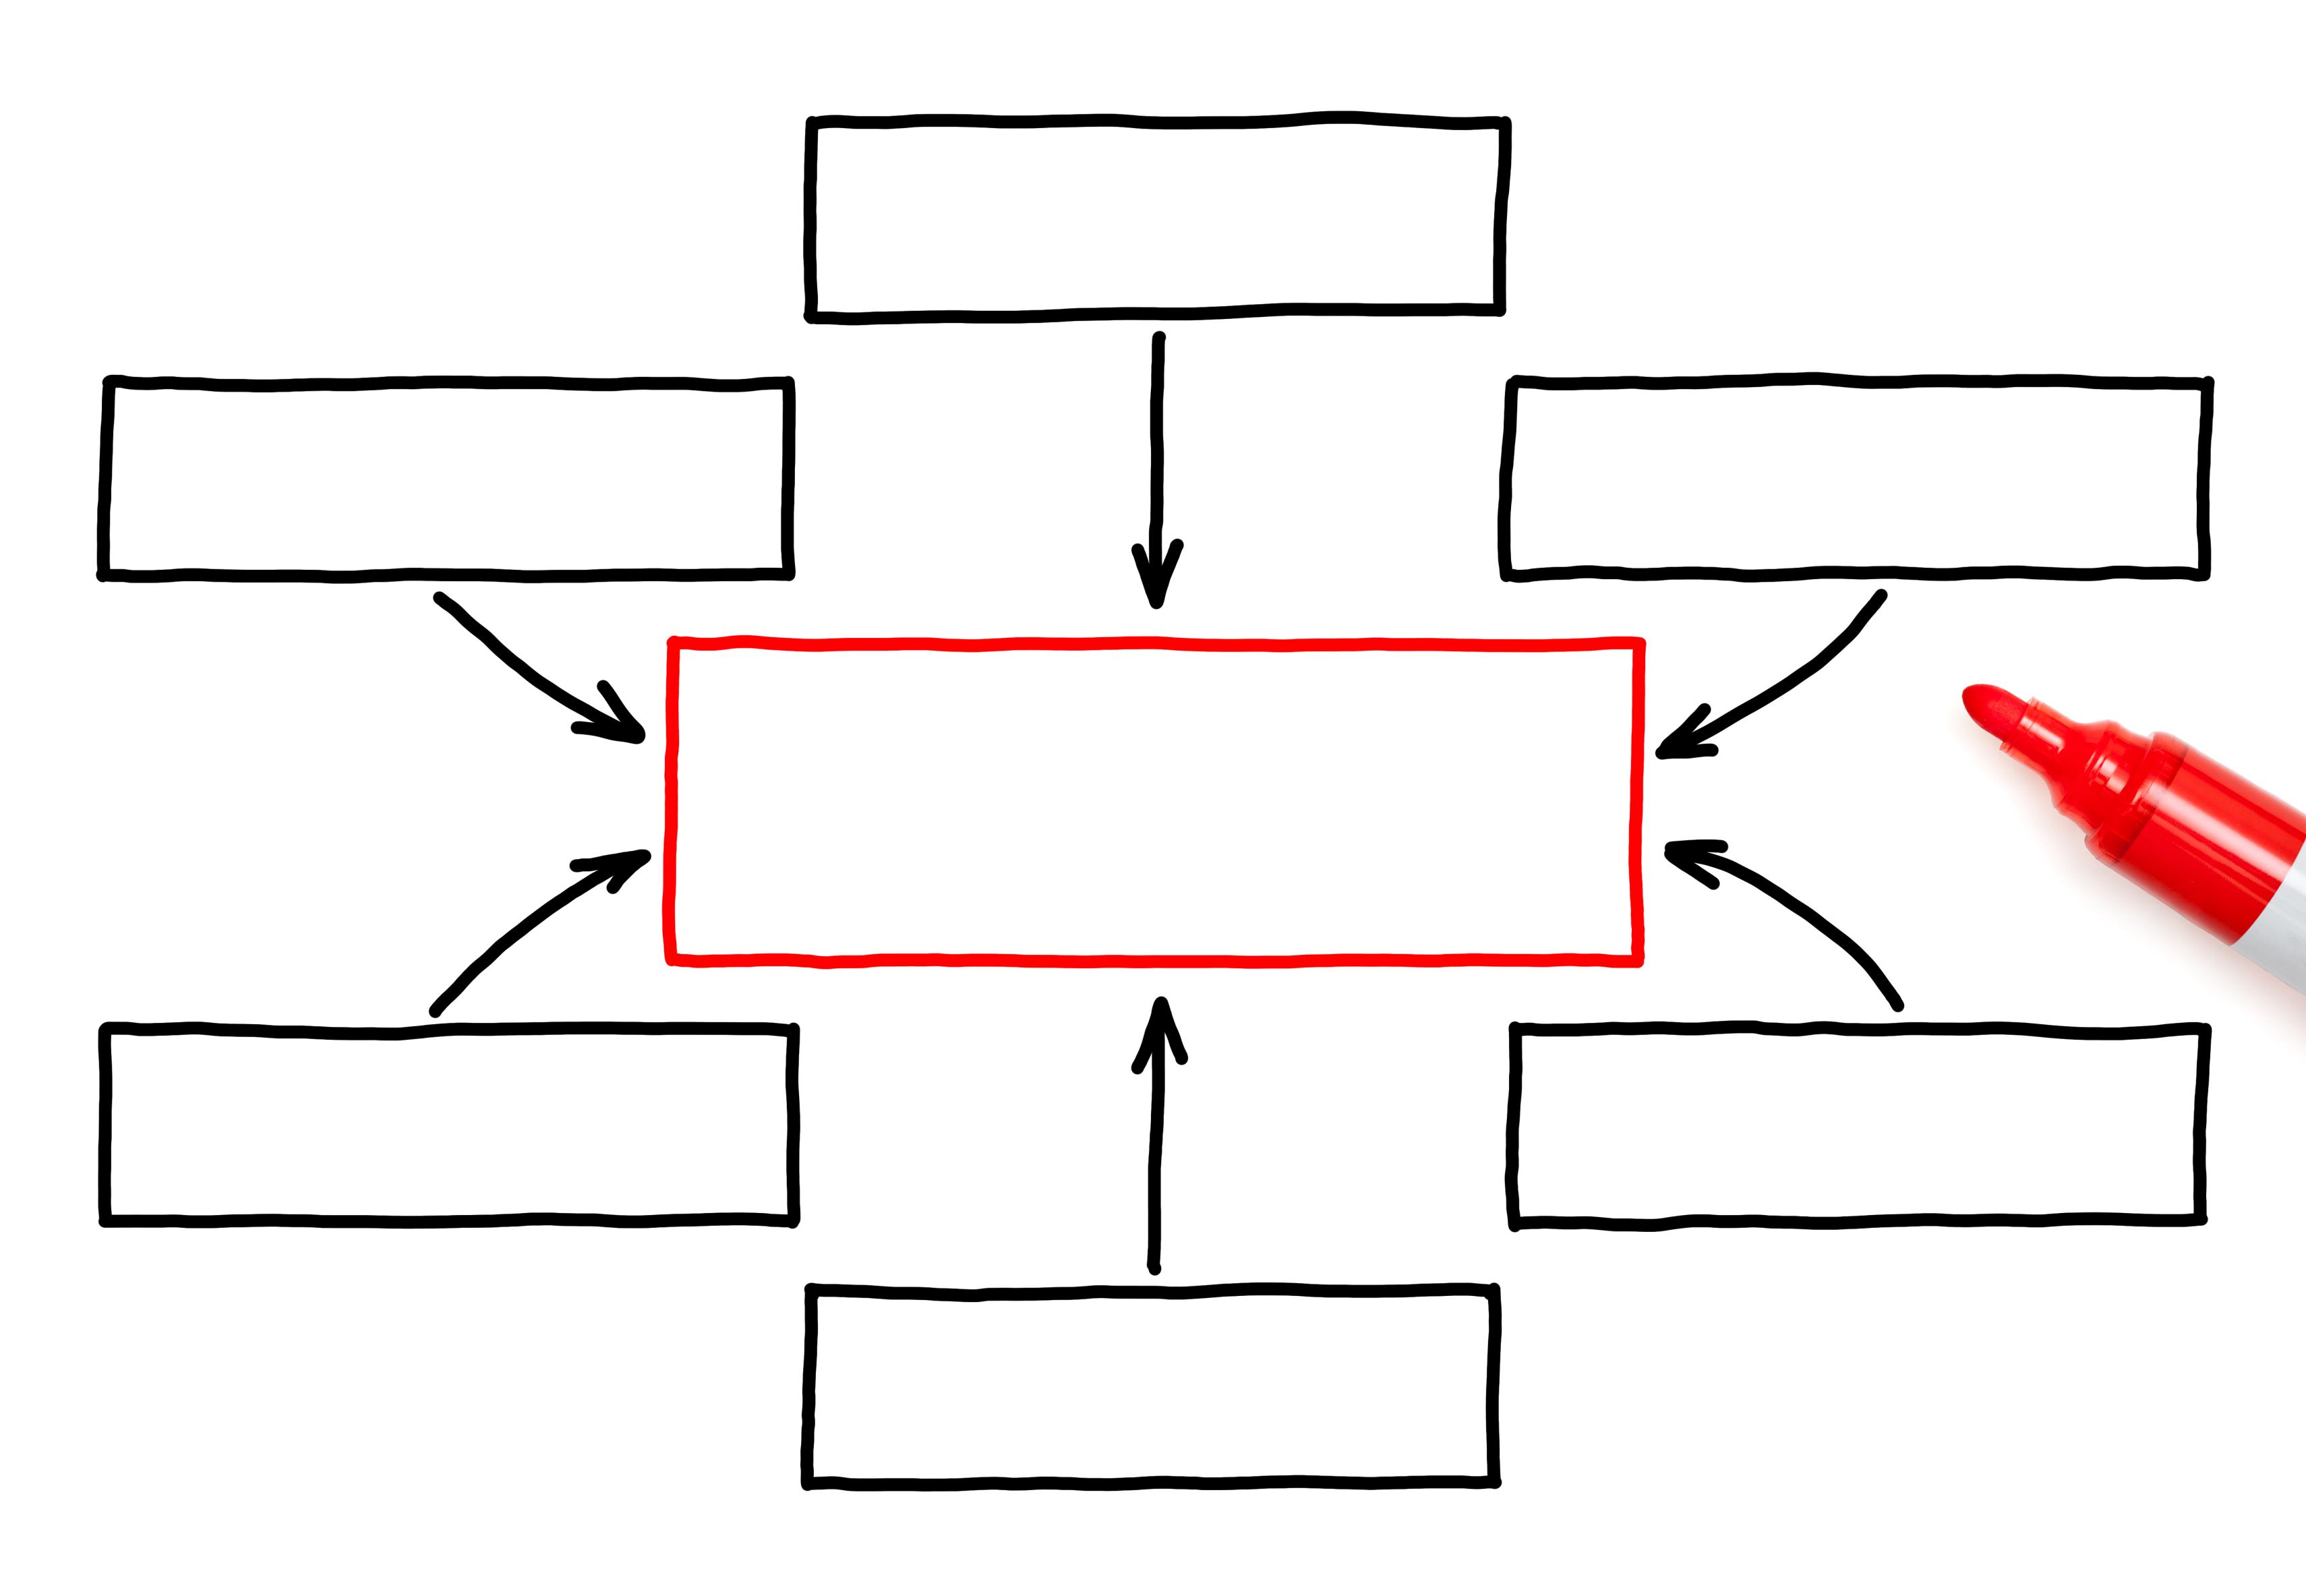 24984309 empty flow chart red marker opcfix 24984309 empty flow chart red marker nvjuhfo Gallery